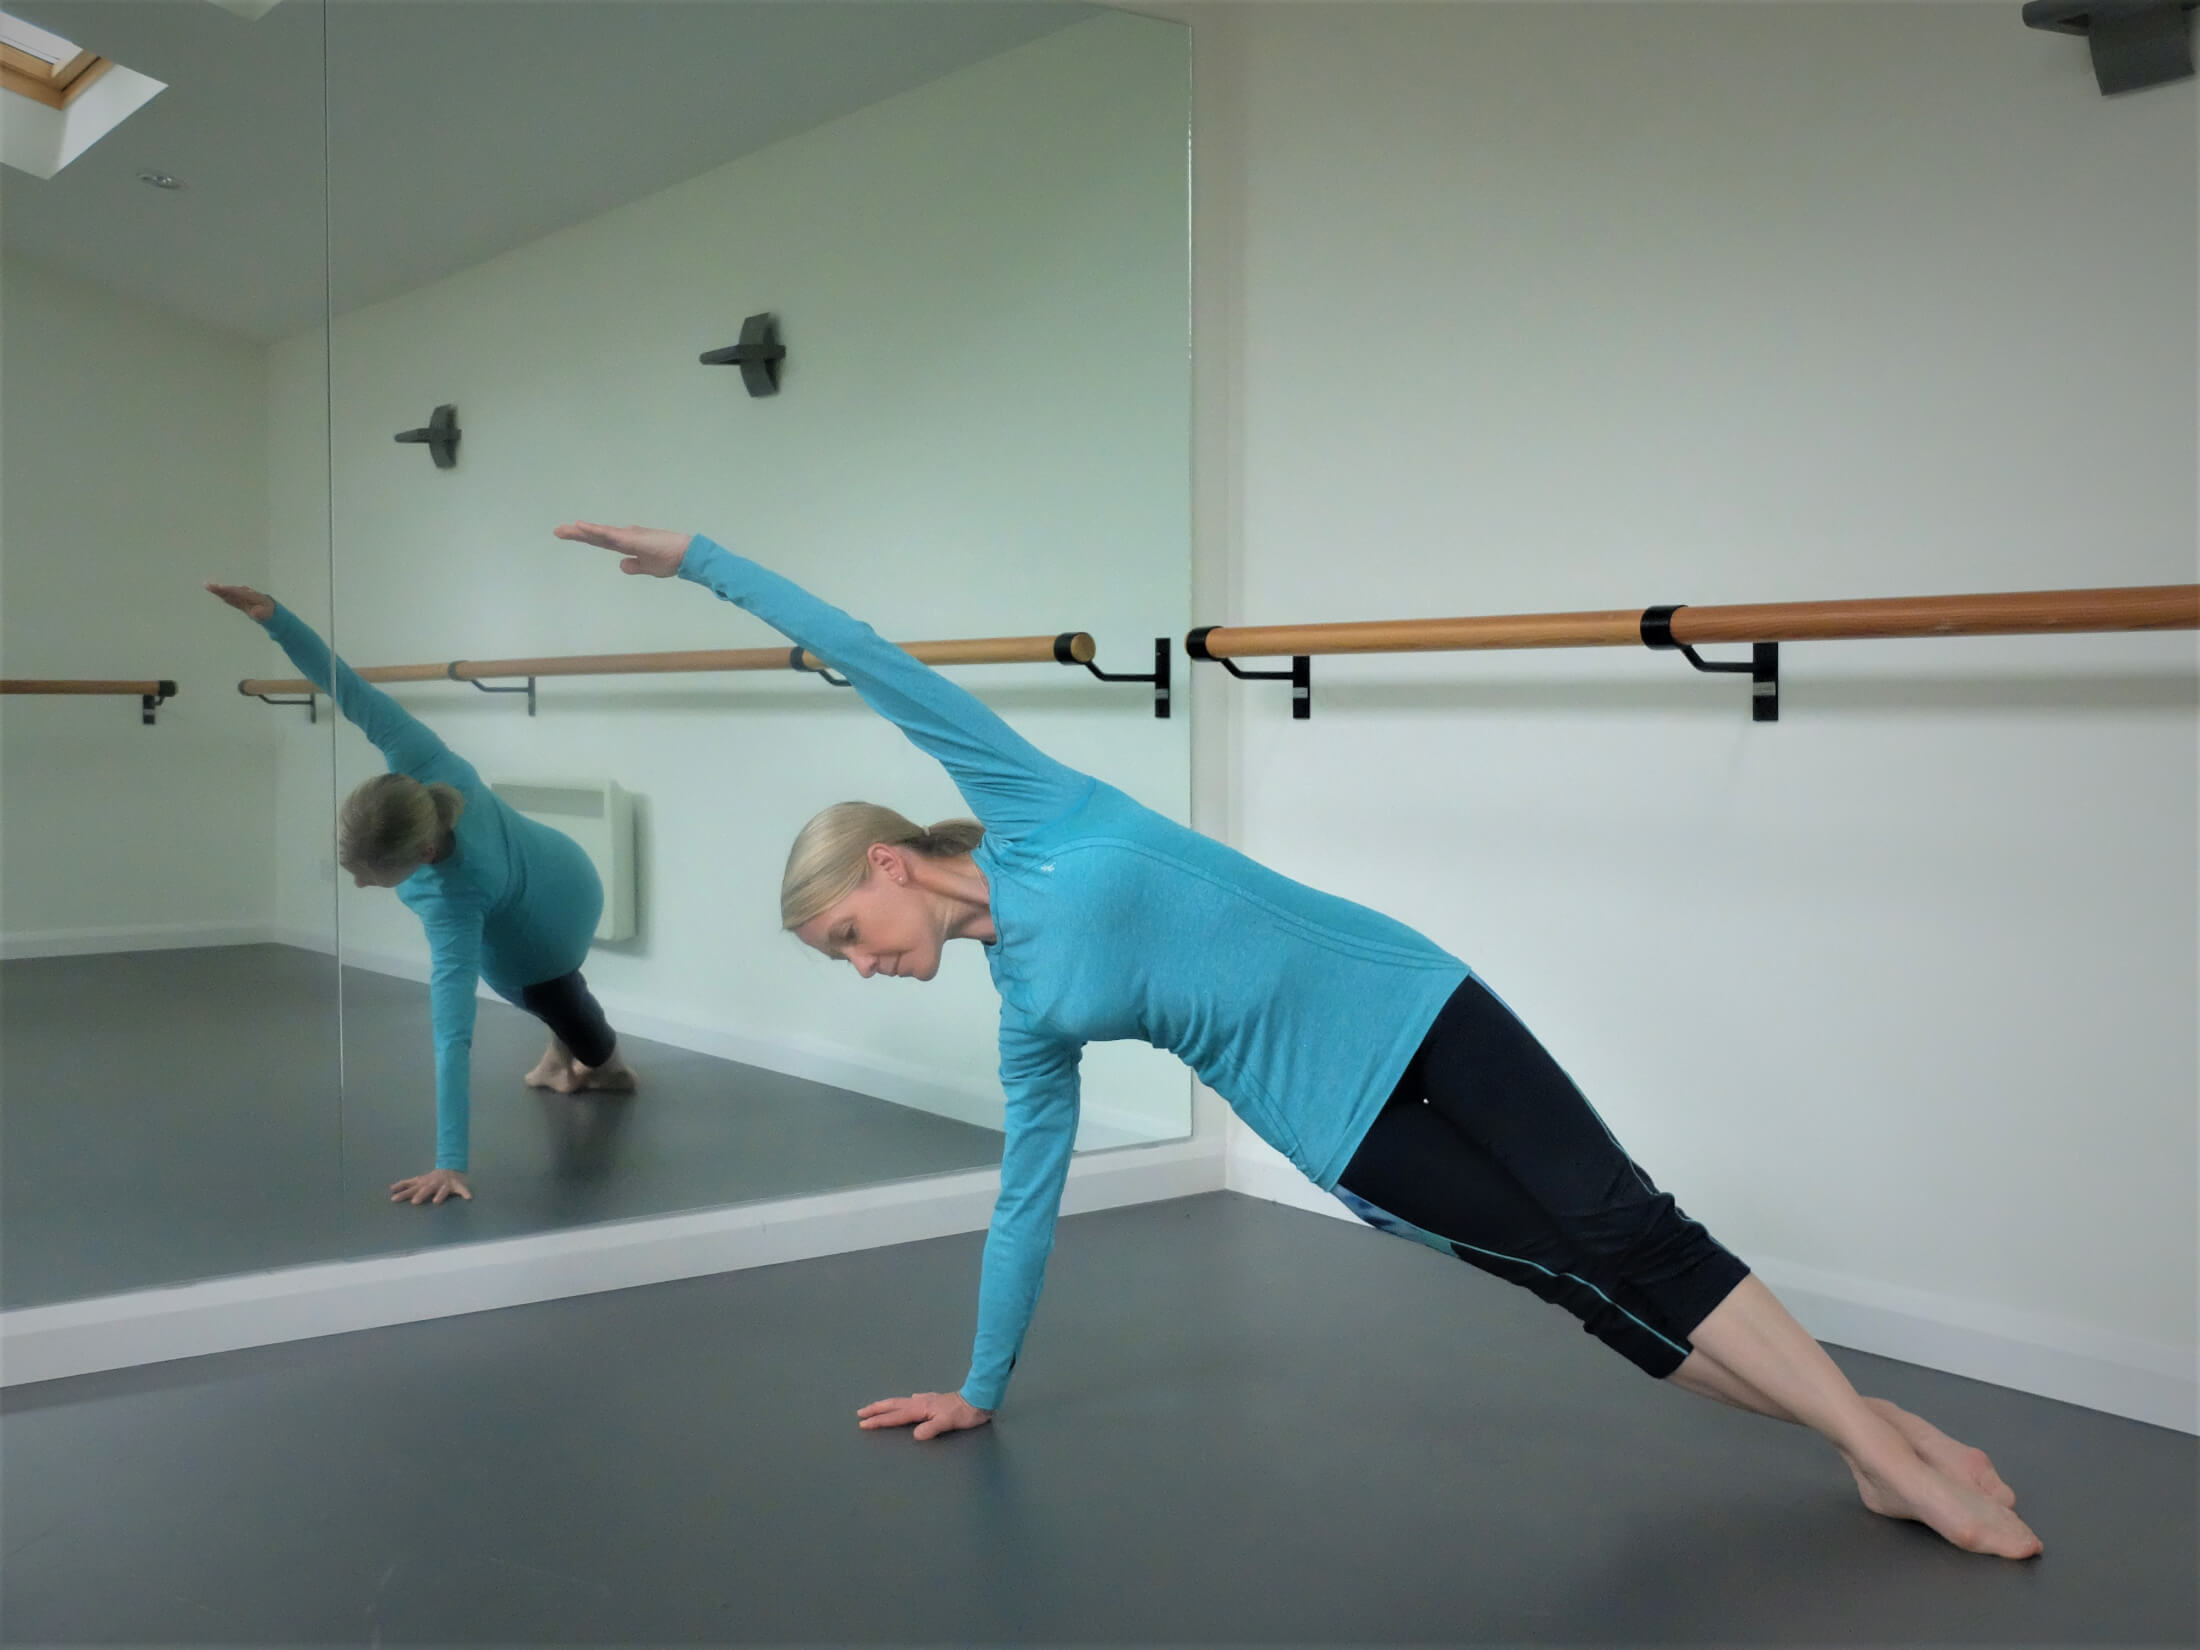 Heather Craig doing a side stretch in a dance studio